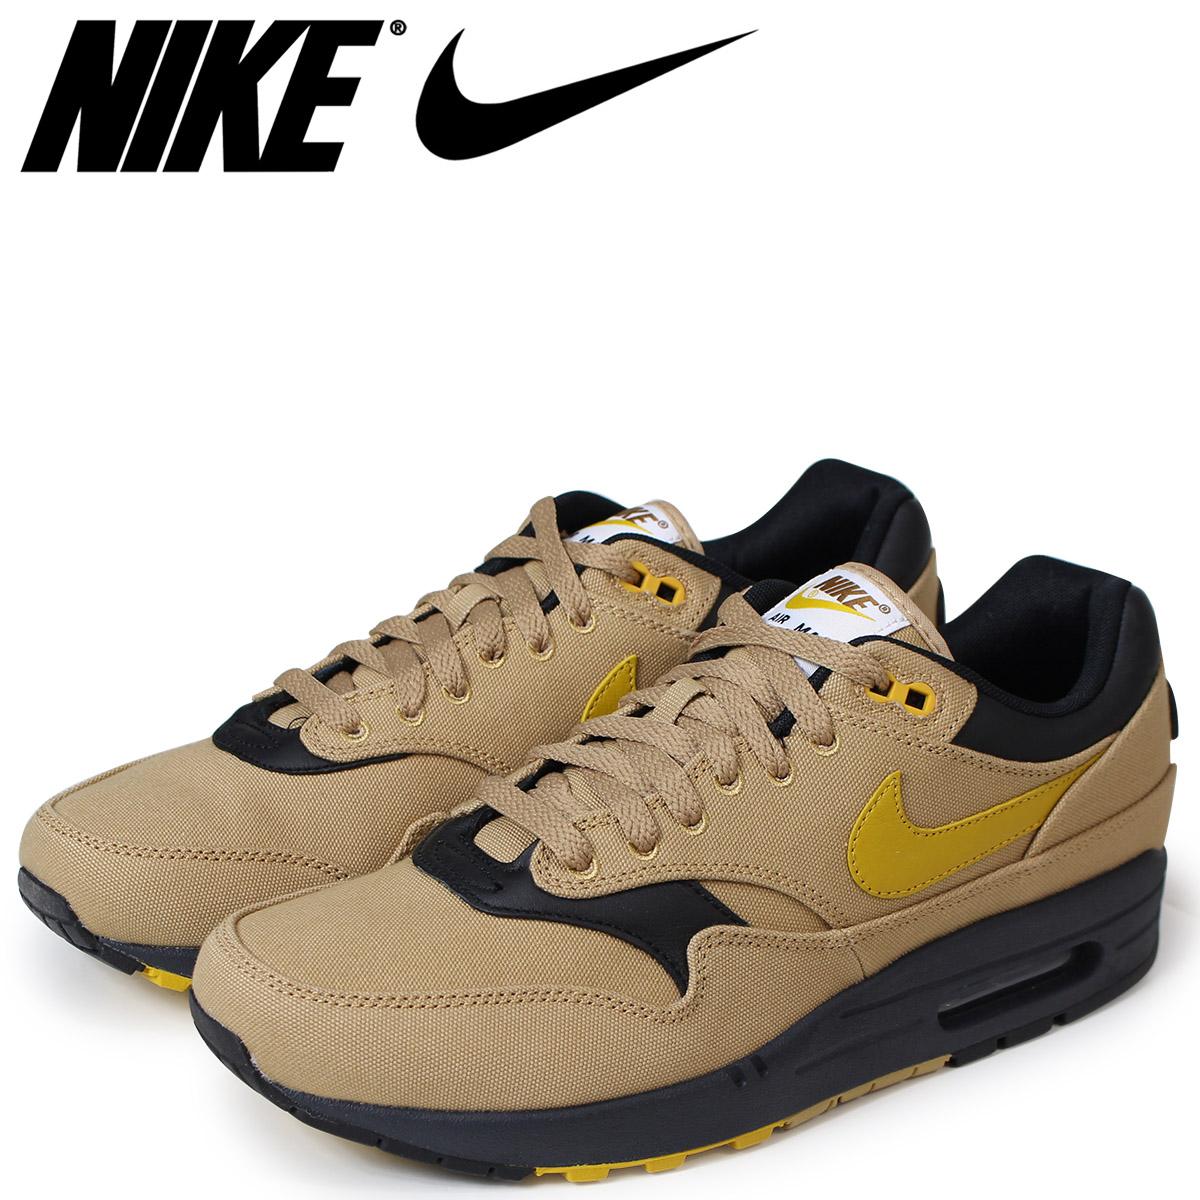 d86a472df1 Sugar Online Shop: NIKE Kie Ney AMAX 1 premium sneakers men AIR MAX 1  PREMIUM 875,844-700 beige [load planned Shinnyu load in reservation product  5/18 ...